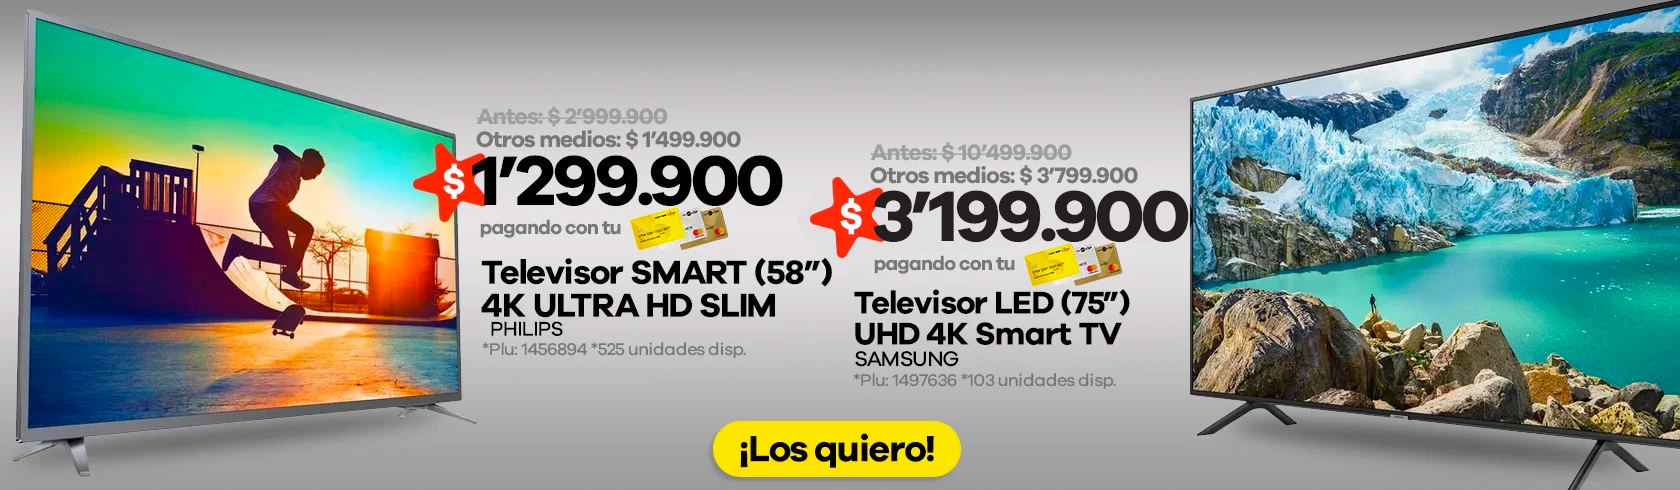 Televisor-LED-Samsung-70-Pulgadas-UHD-4K-Smart-TV-Serie-7